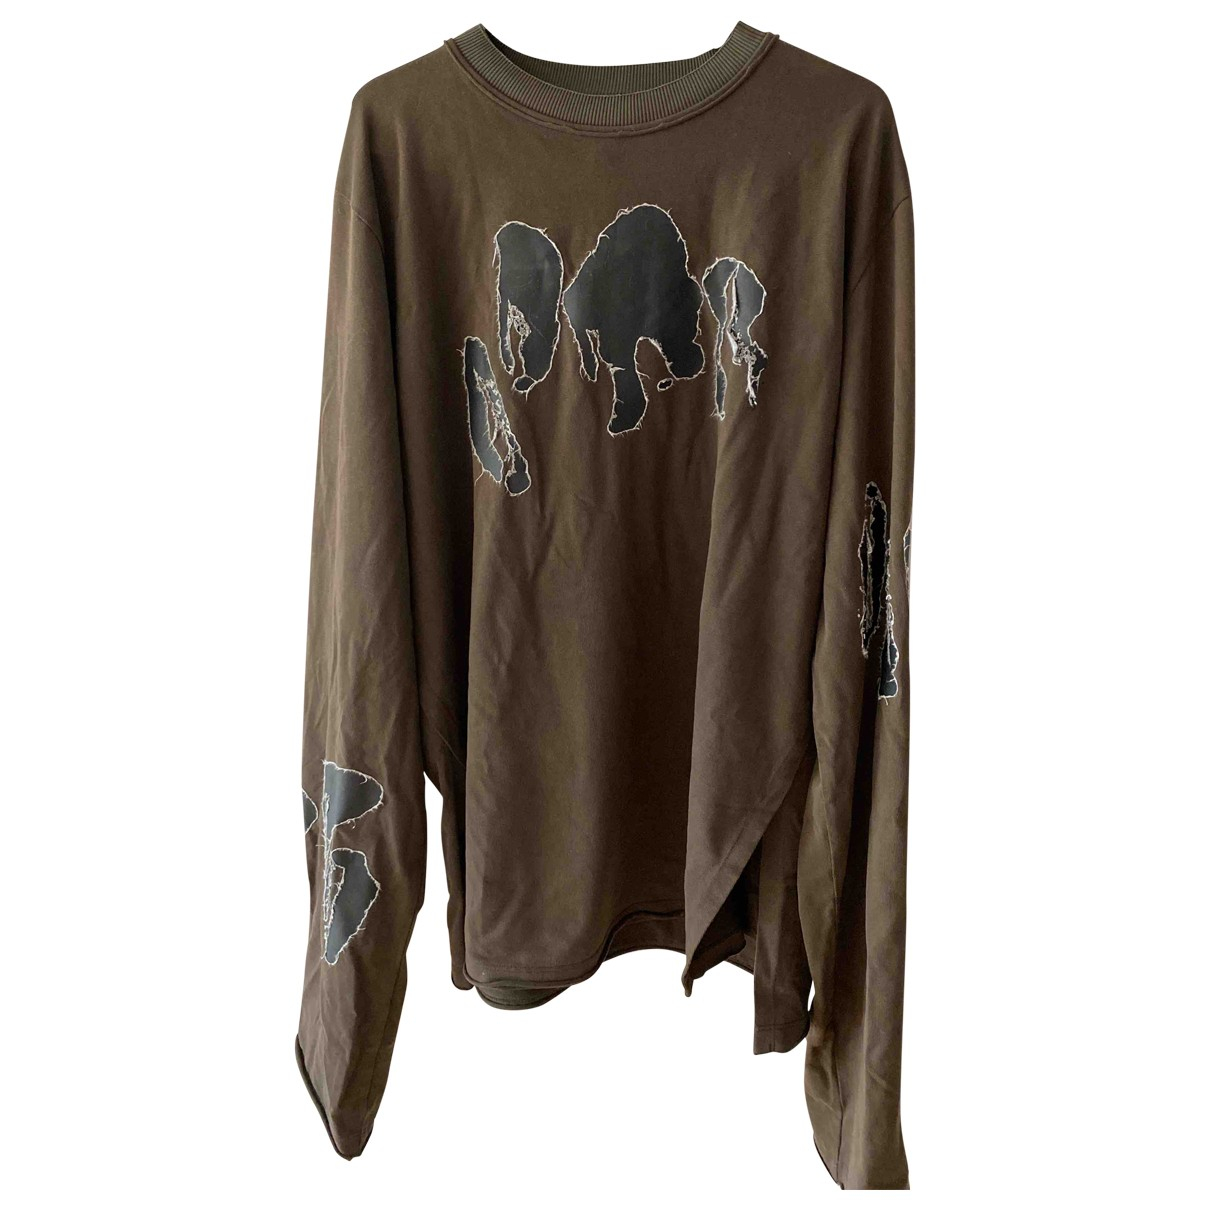 Damir Doma \N Khaki Cotton Knitwear & Sweatshirts for Men M International